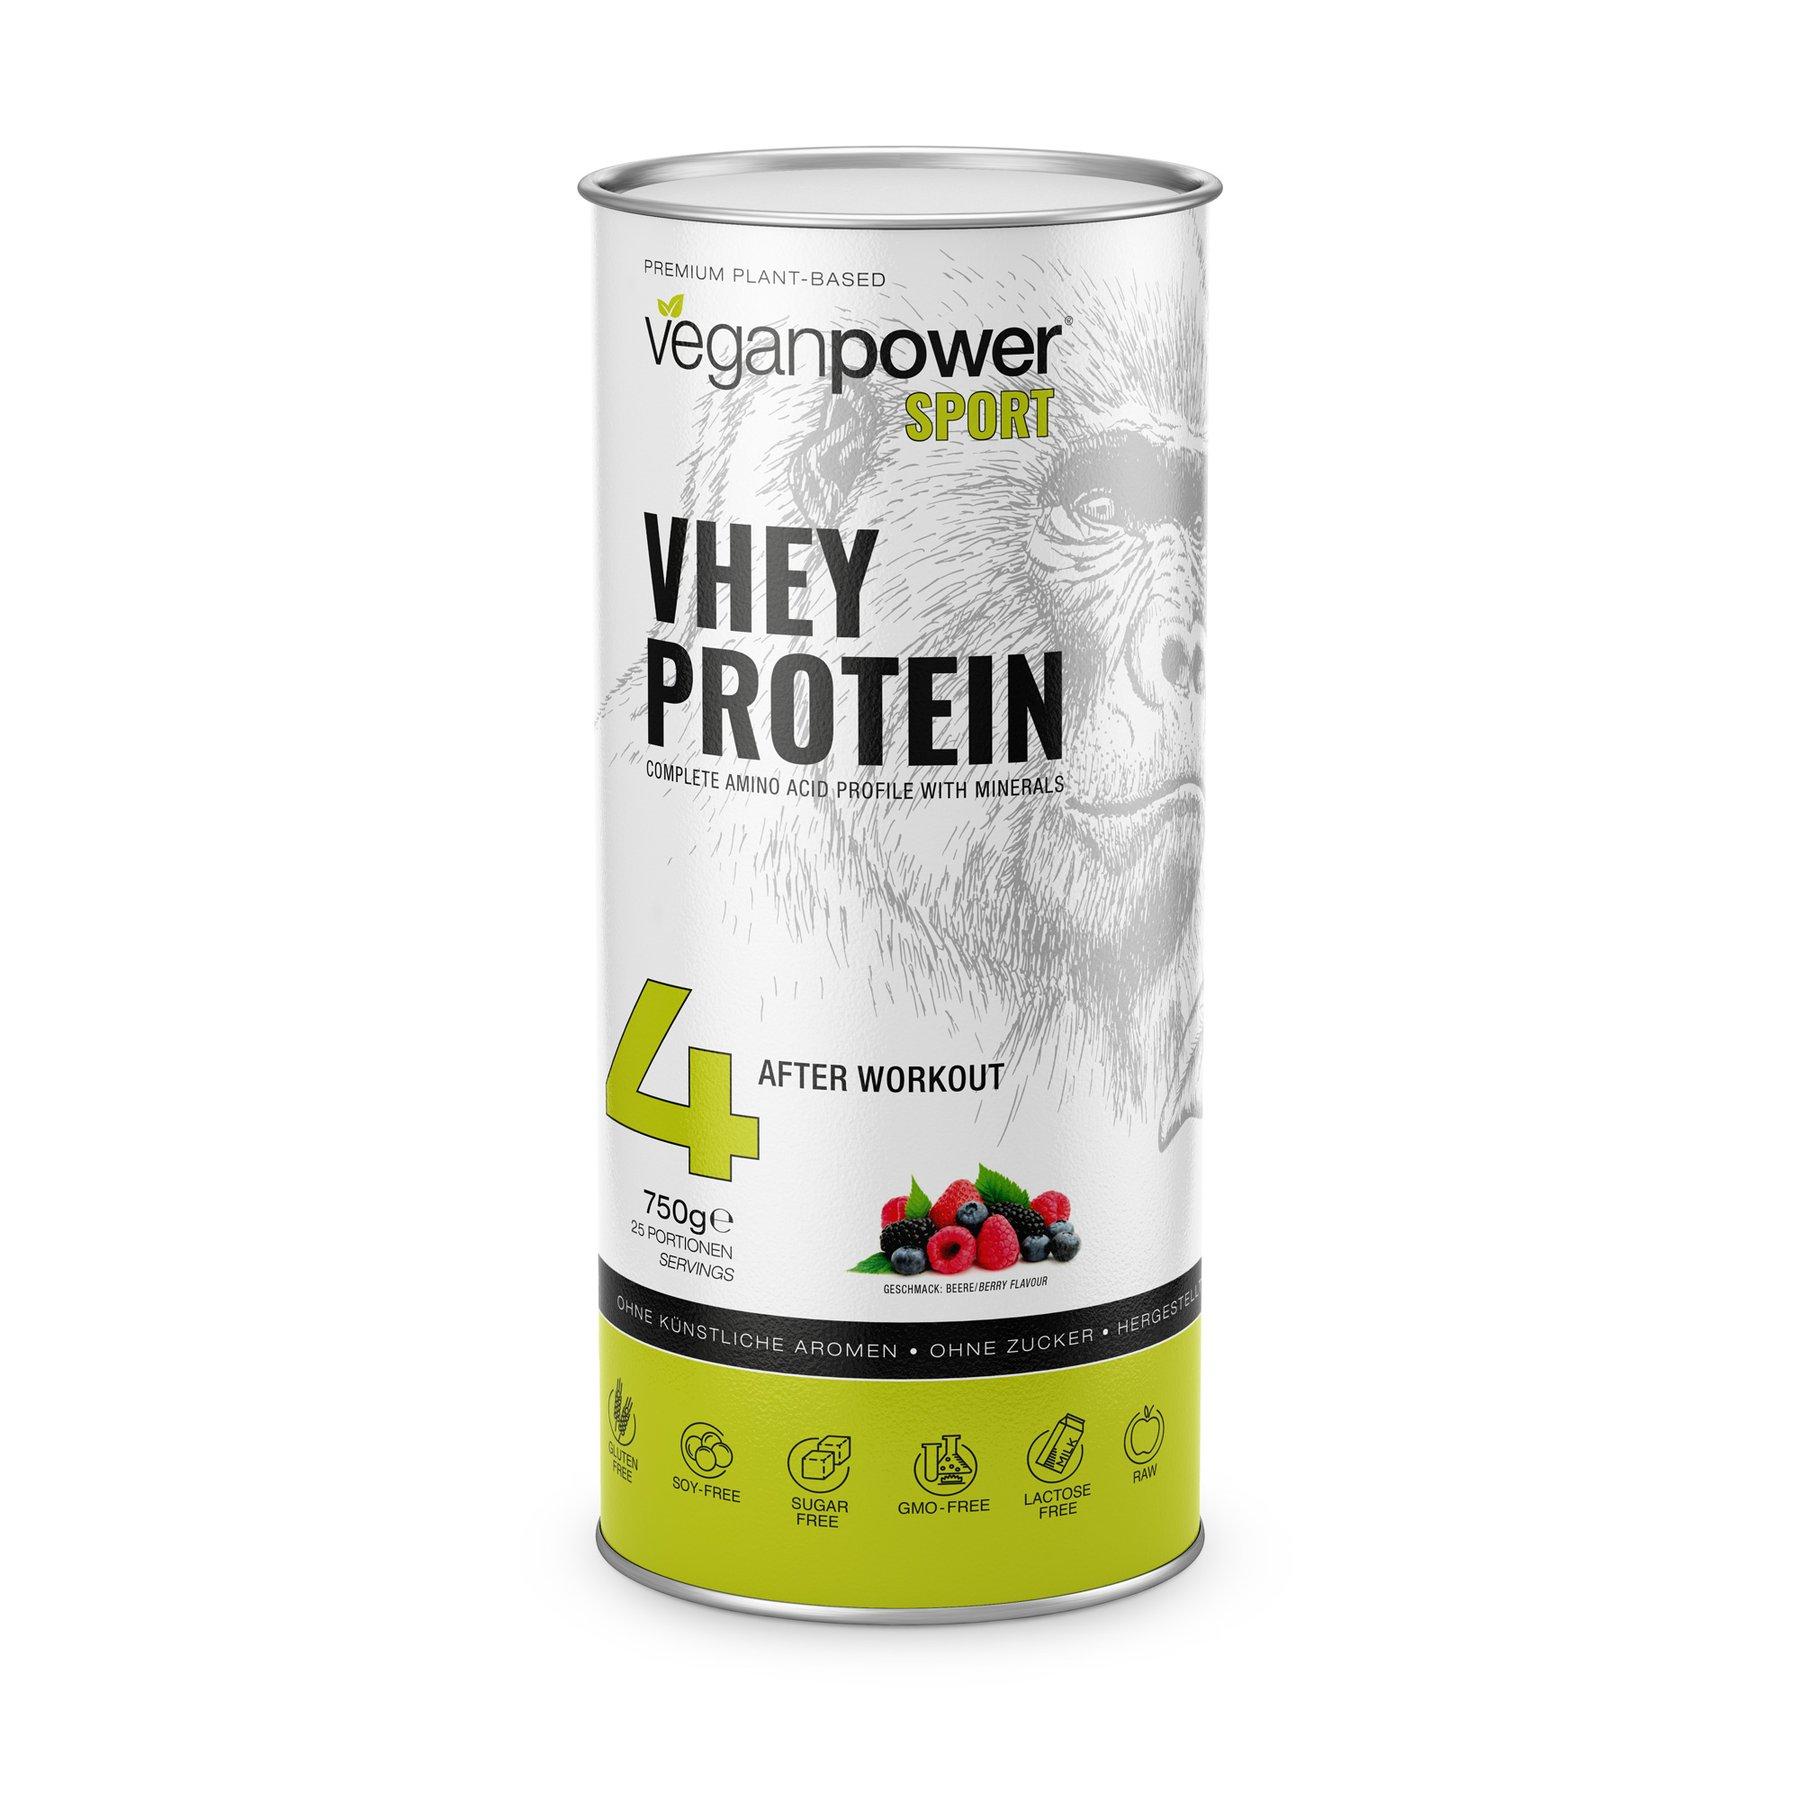 vegane-sportnahrung-vhey-protein